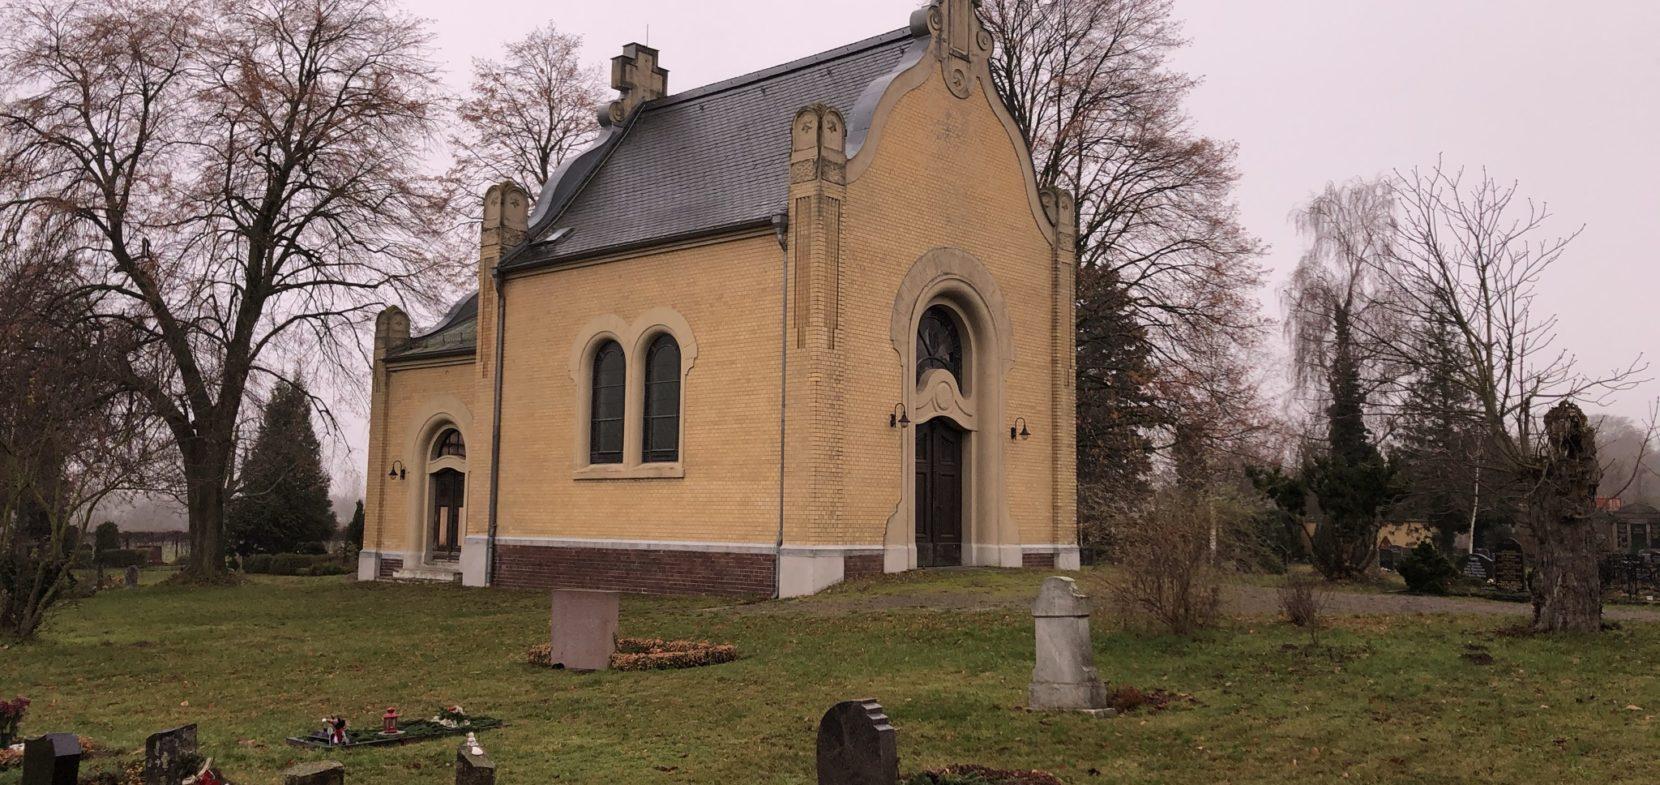 Friedhofskapelle Lindenthal